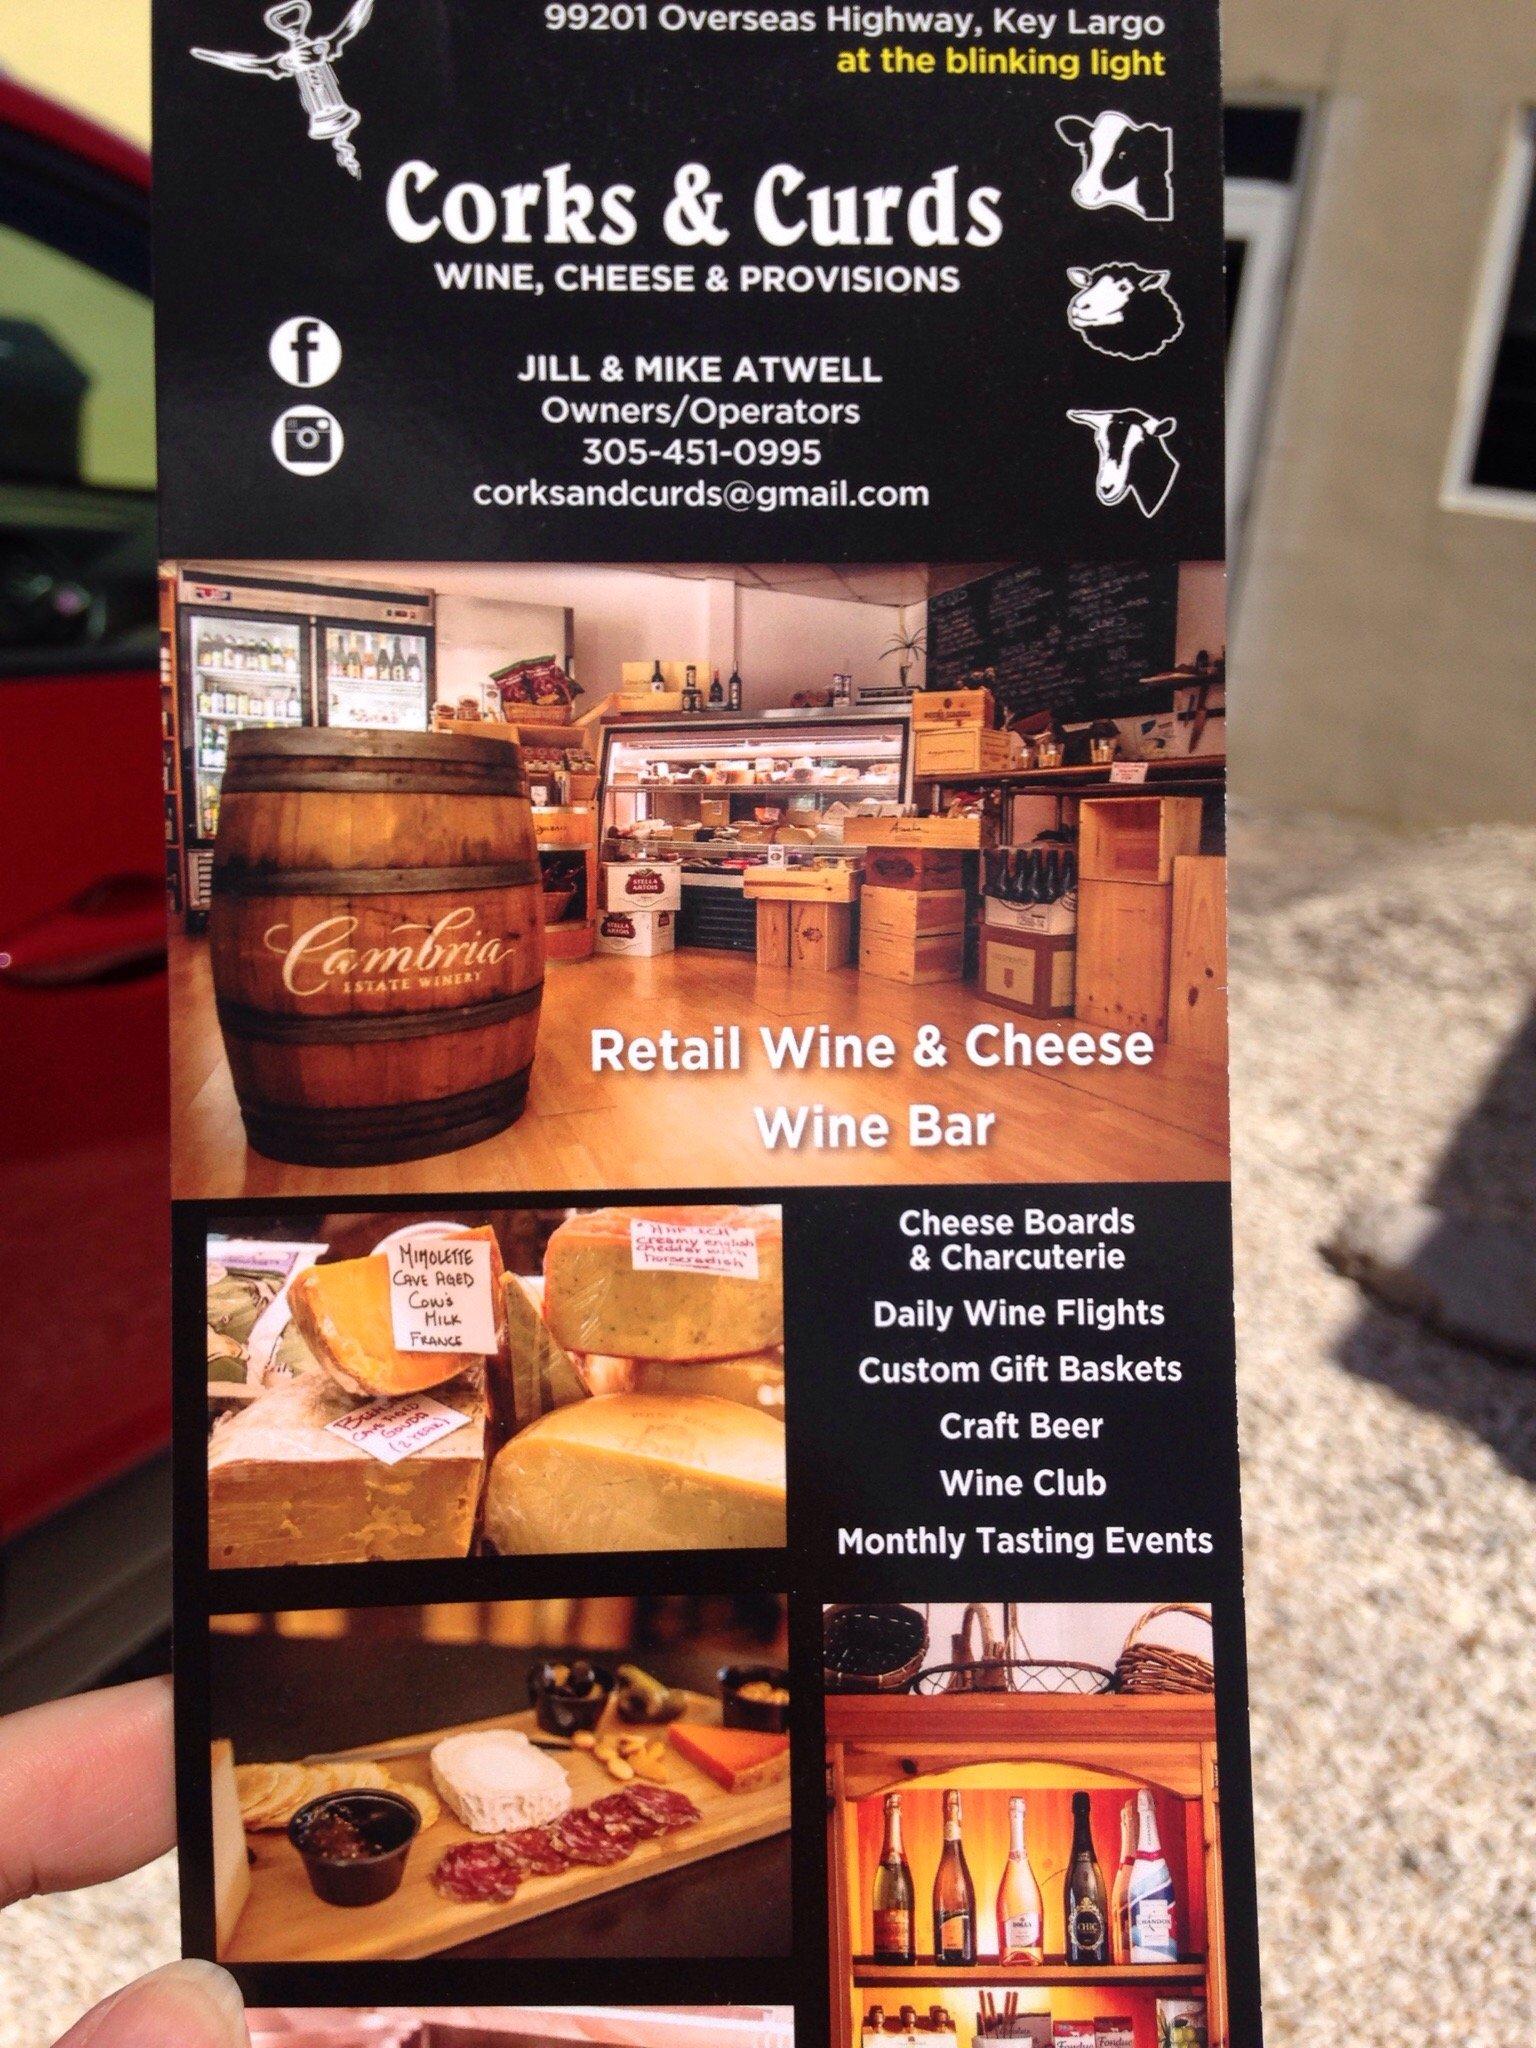 corks u0026 curds wine cheese u0026 provisions key largo restaurant